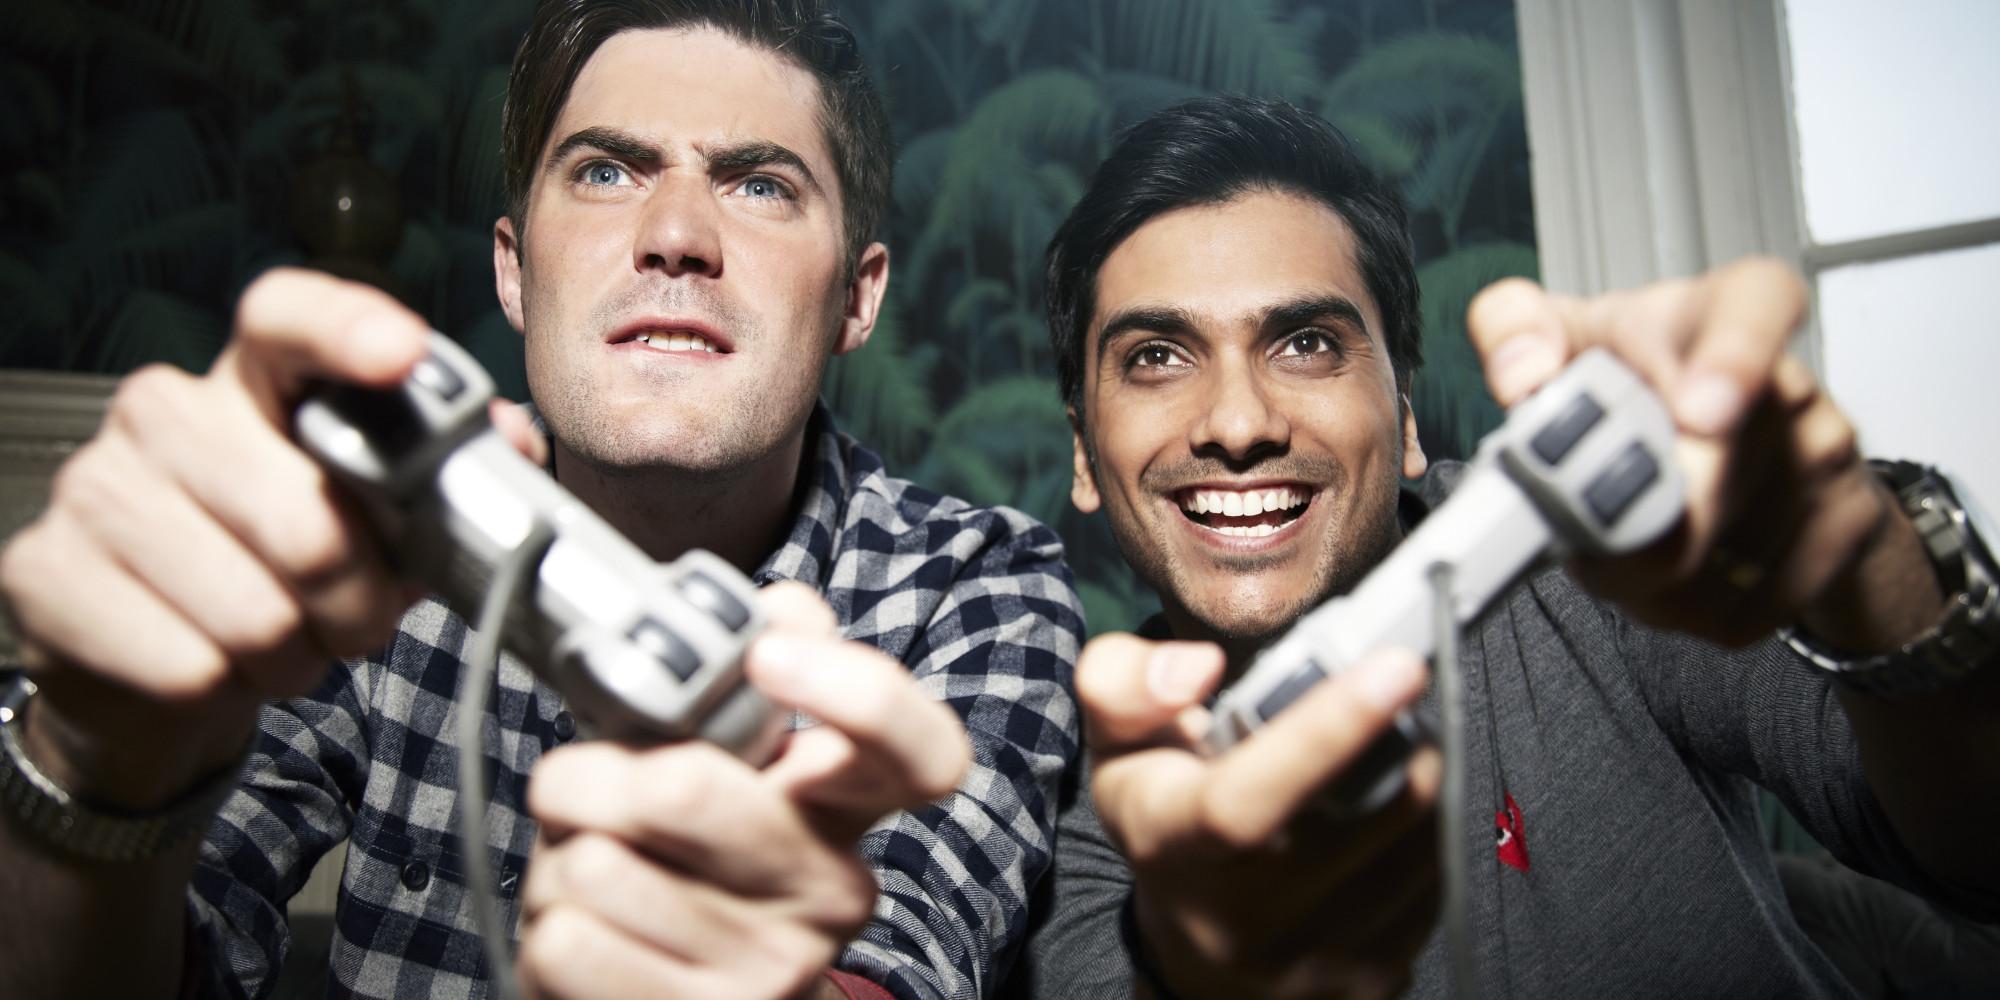 Welch teens watch violent video games